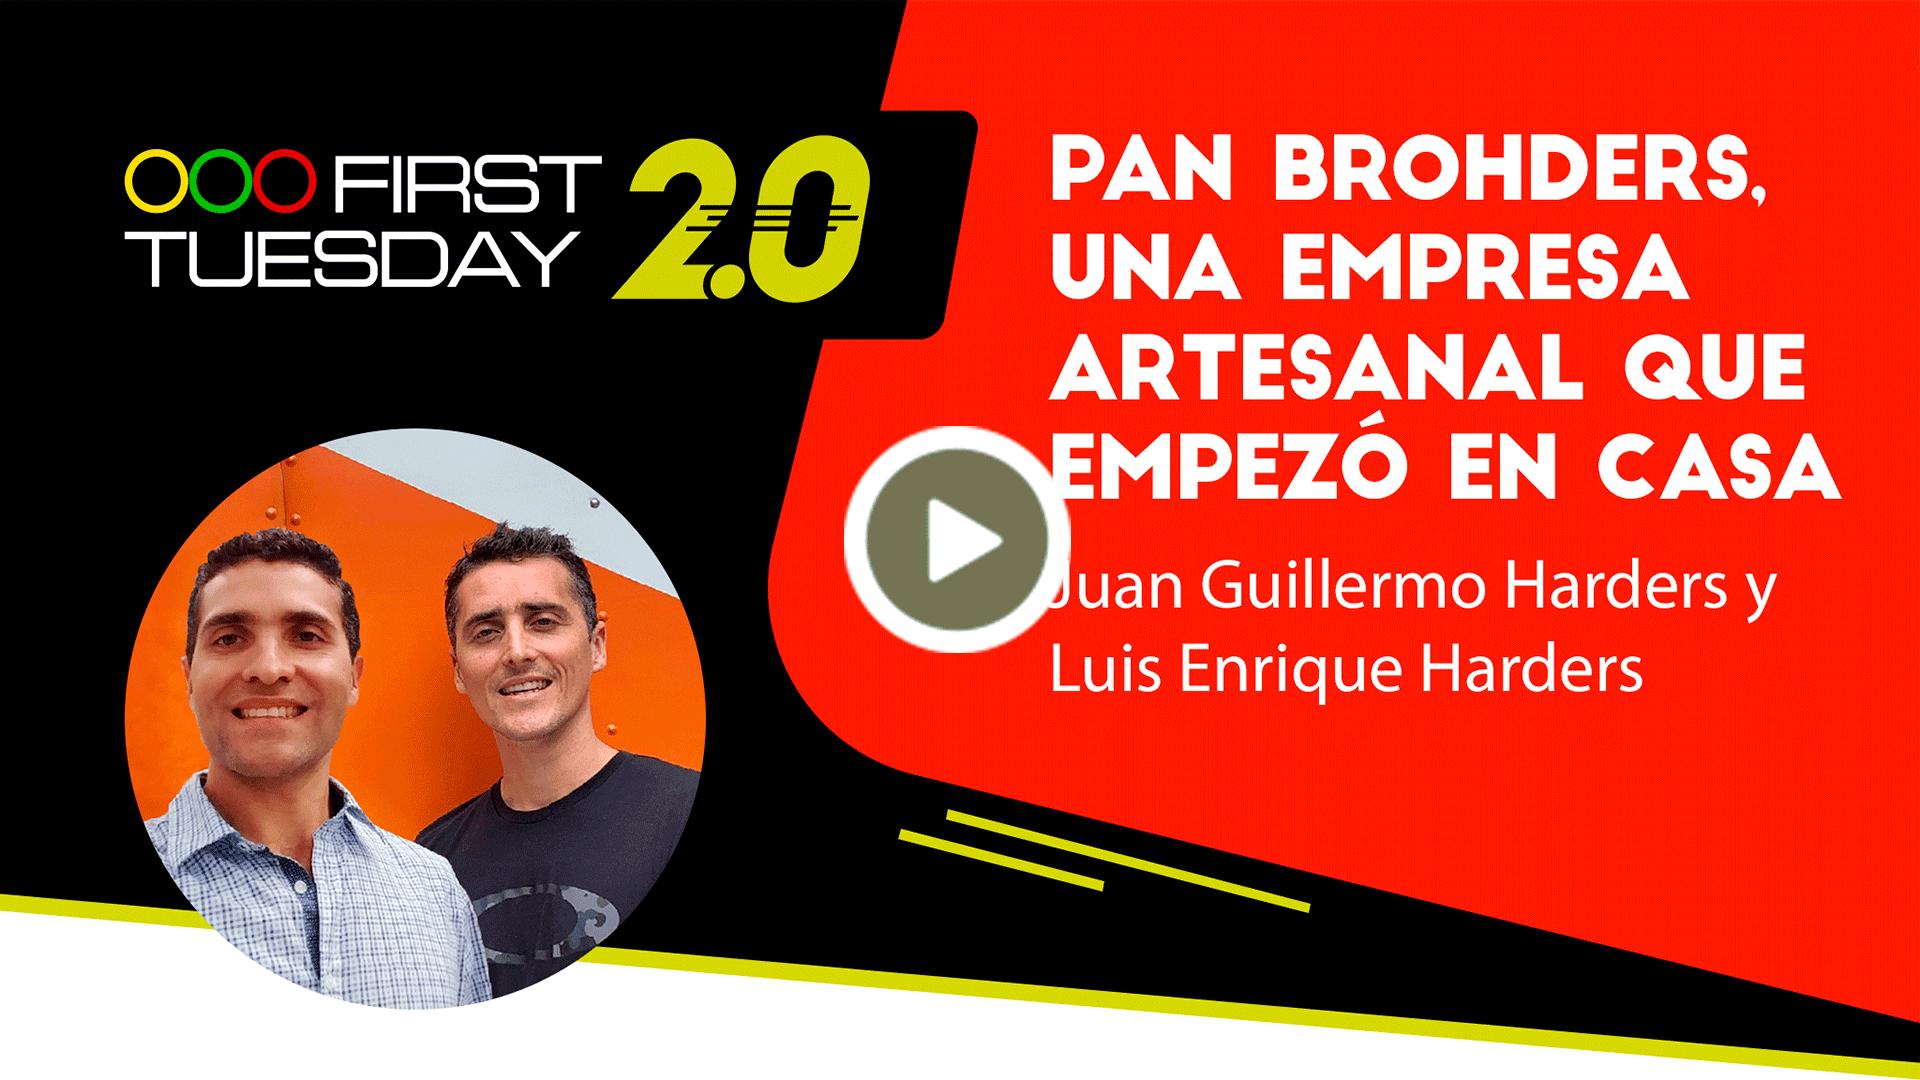 20200602_firsttuesday1_First_Tuesday_Pan-Brohders